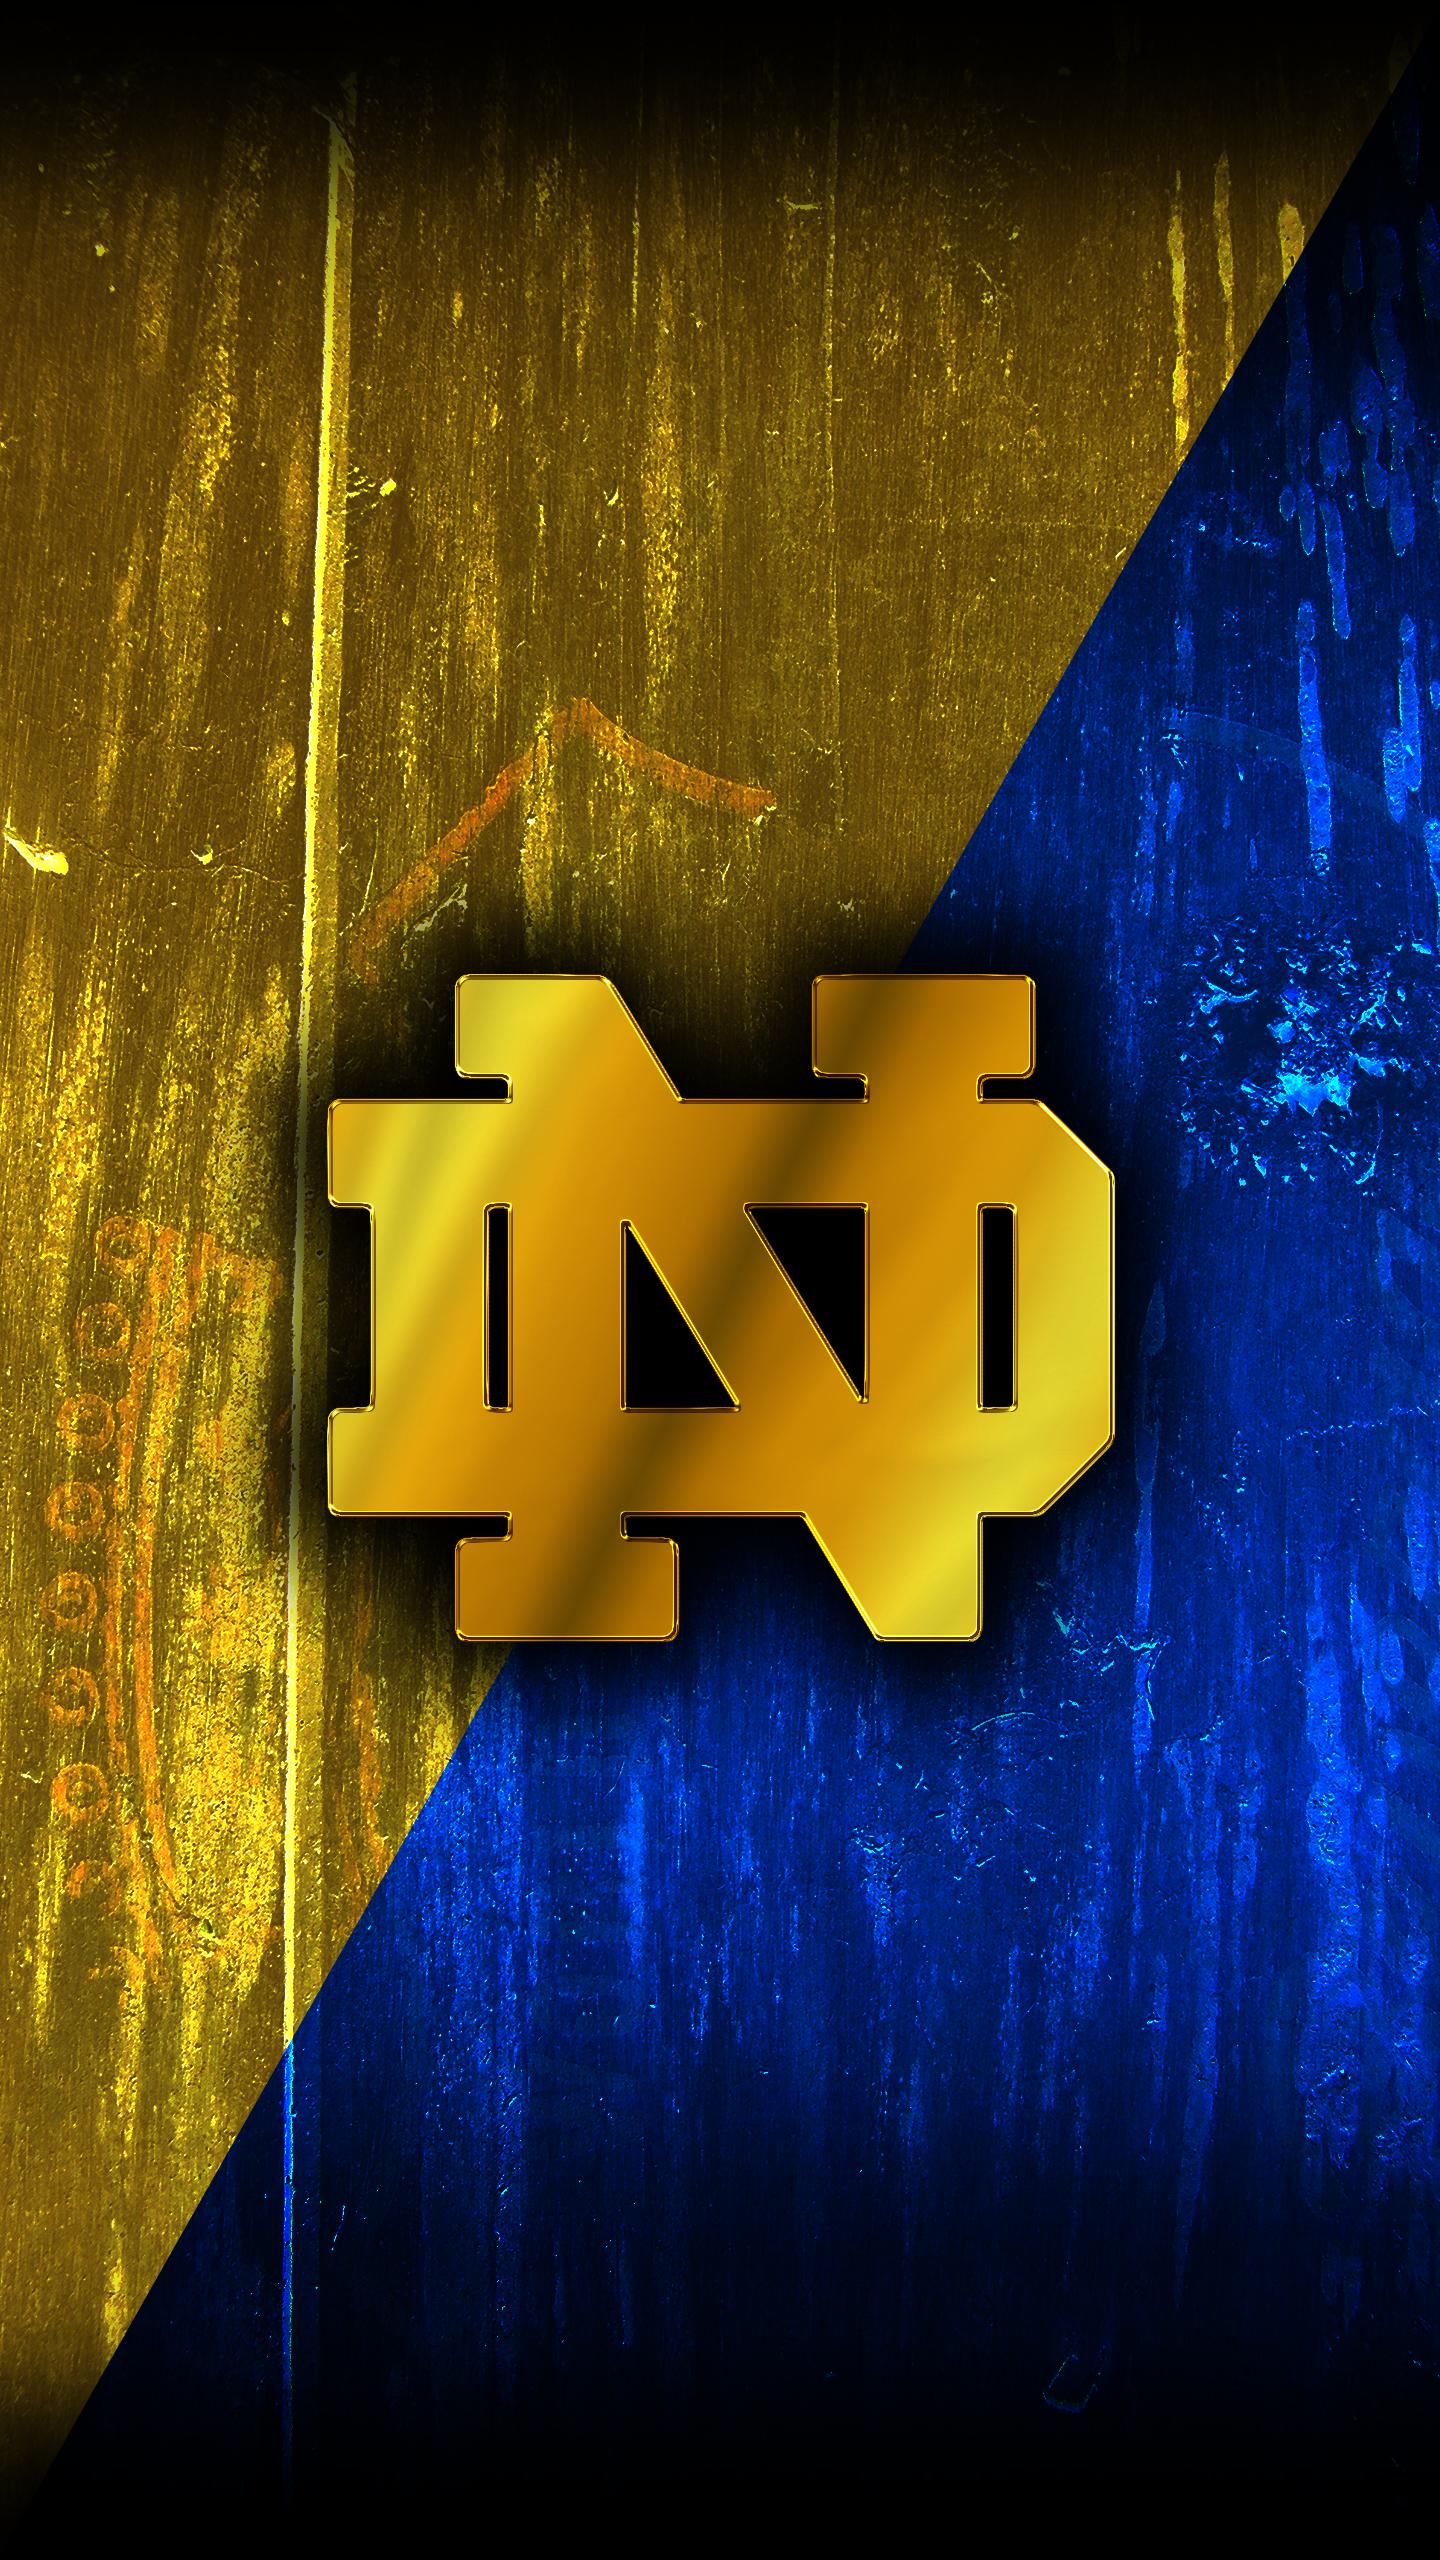 Notre Dame Wallpaper For Smartphones Notre Dame Wallpaper Notre Dame Fighting Irish Notre Dame Fighting Irish Football